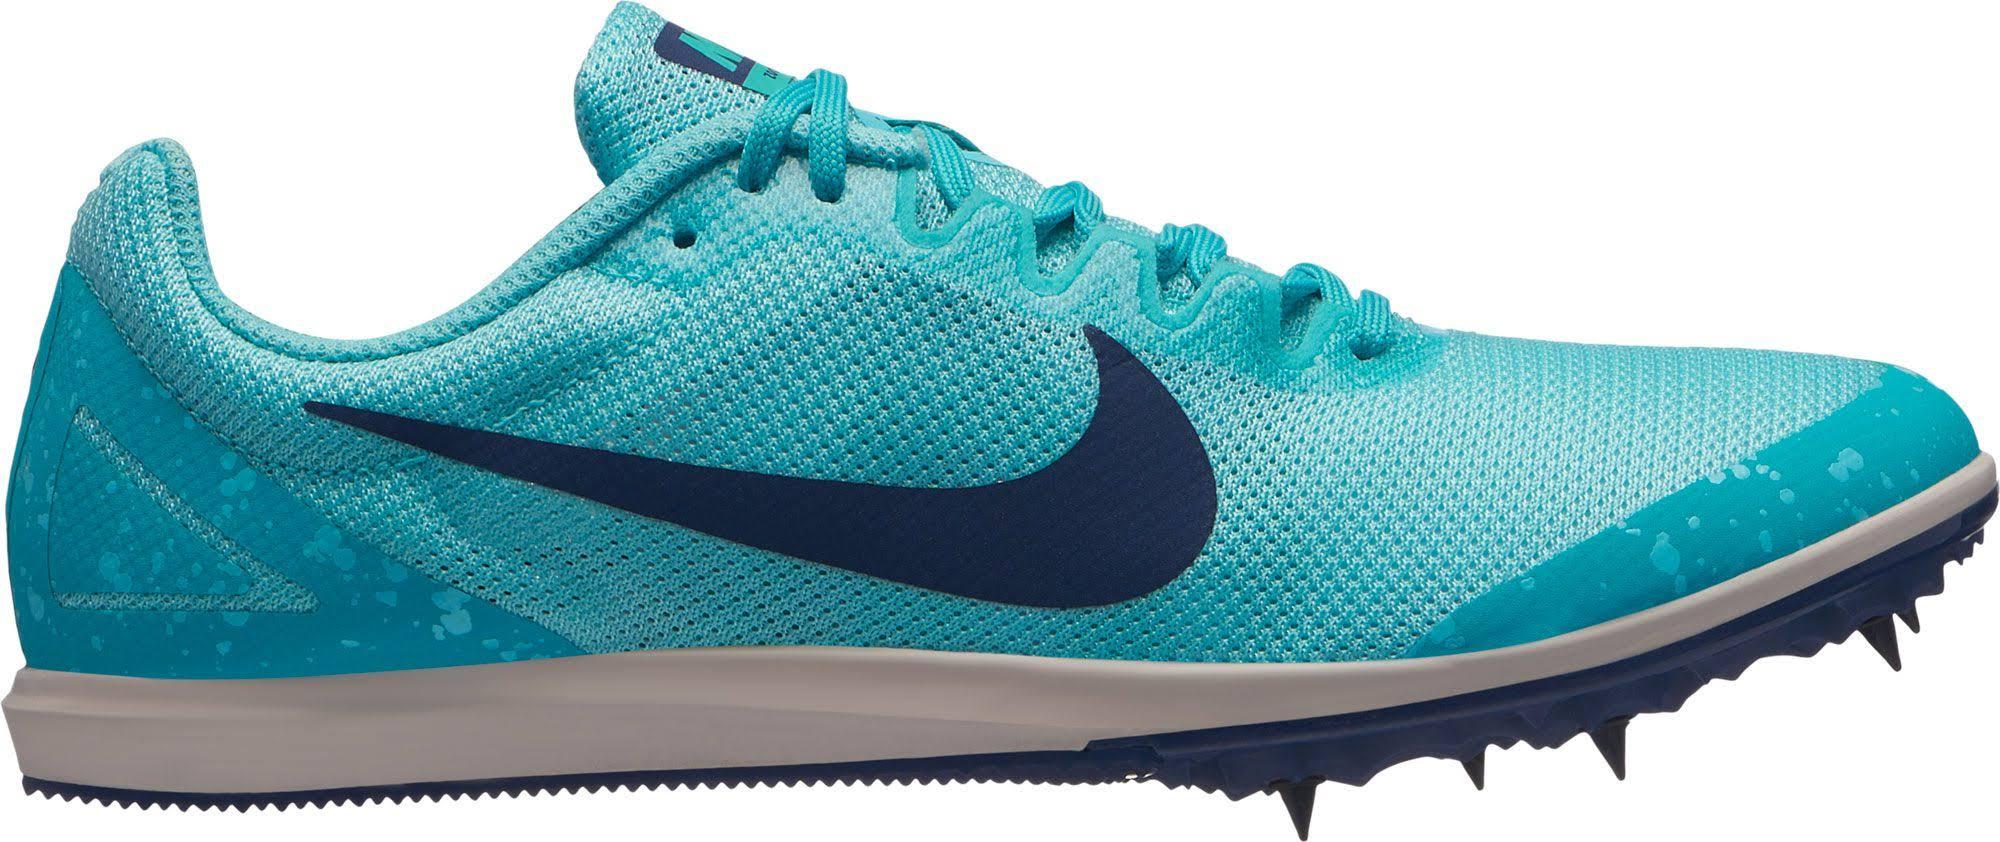 Nike Spike Wom Aurora Azul Jade Void Hyper Rival 6 Verde D 10 5 xITwBIOqr